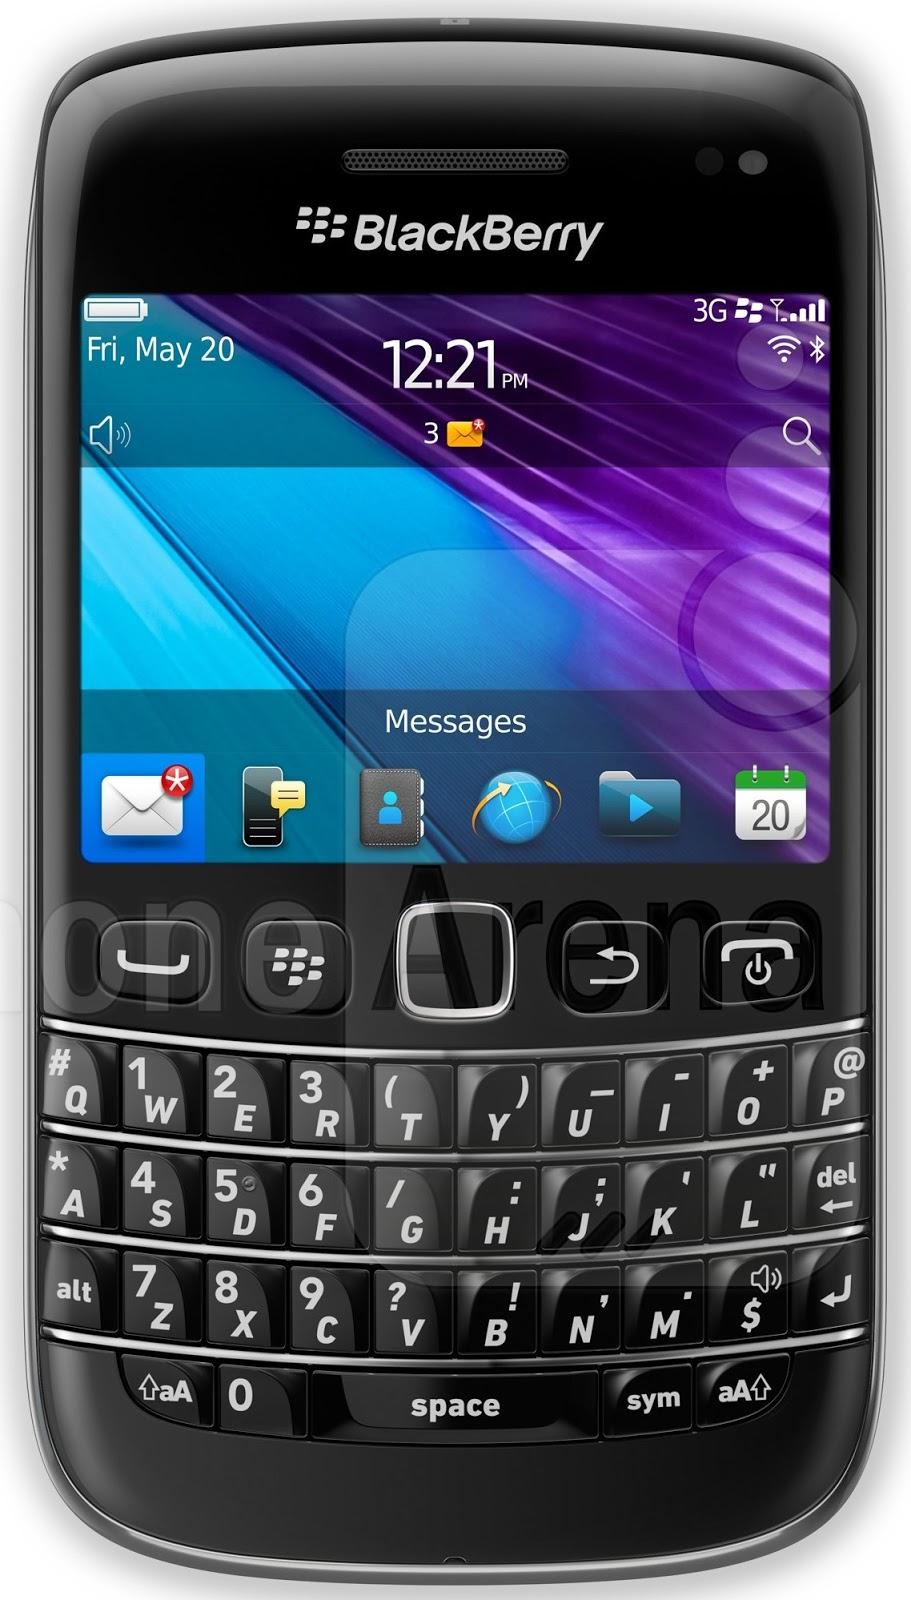 RajaHarga: Harga BlackBerry Bold 9790